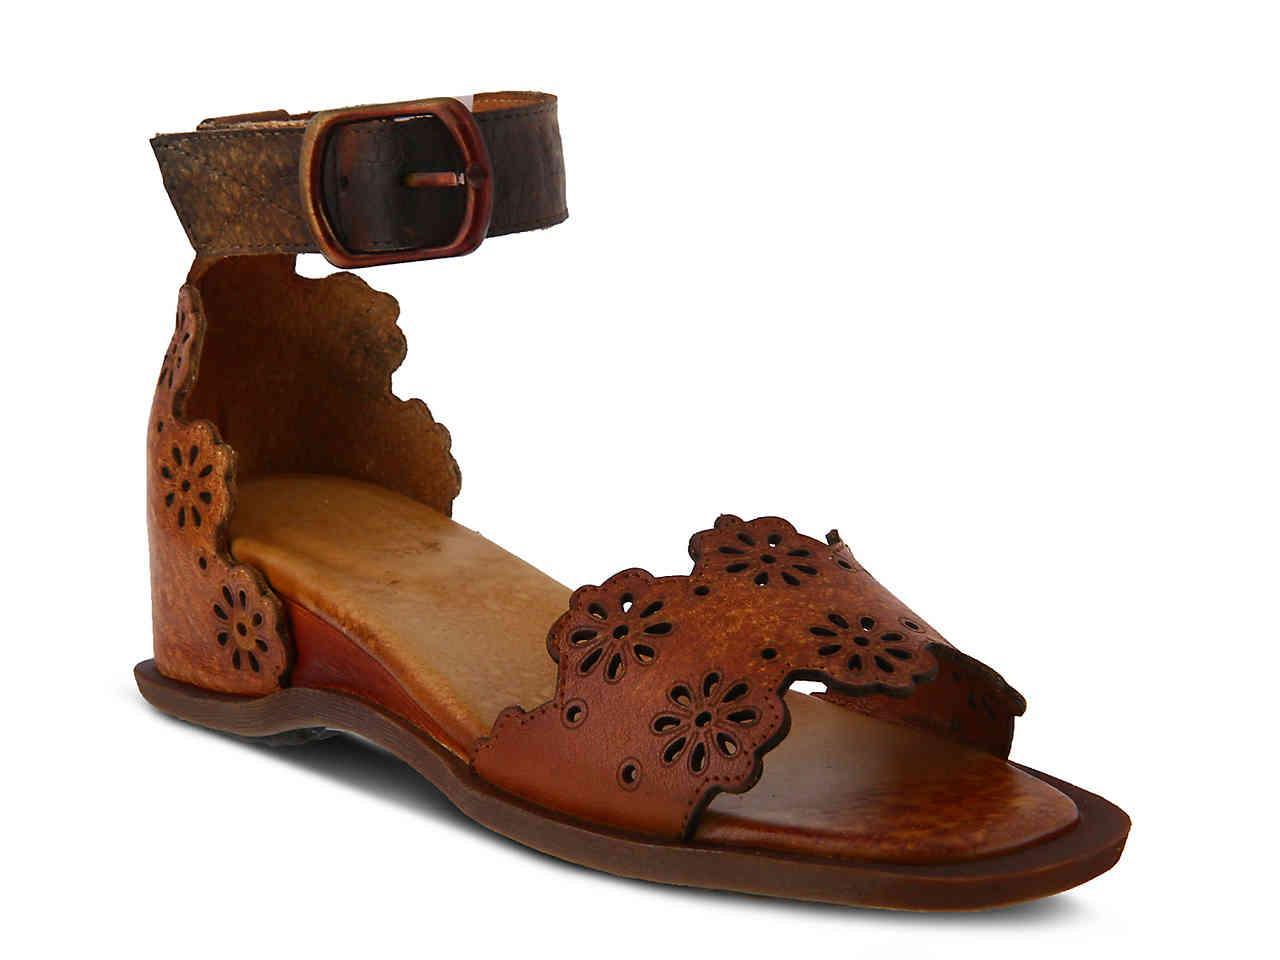 cbef79836e Lyst - Spring Step Niarah Wedge Sandal in Brown